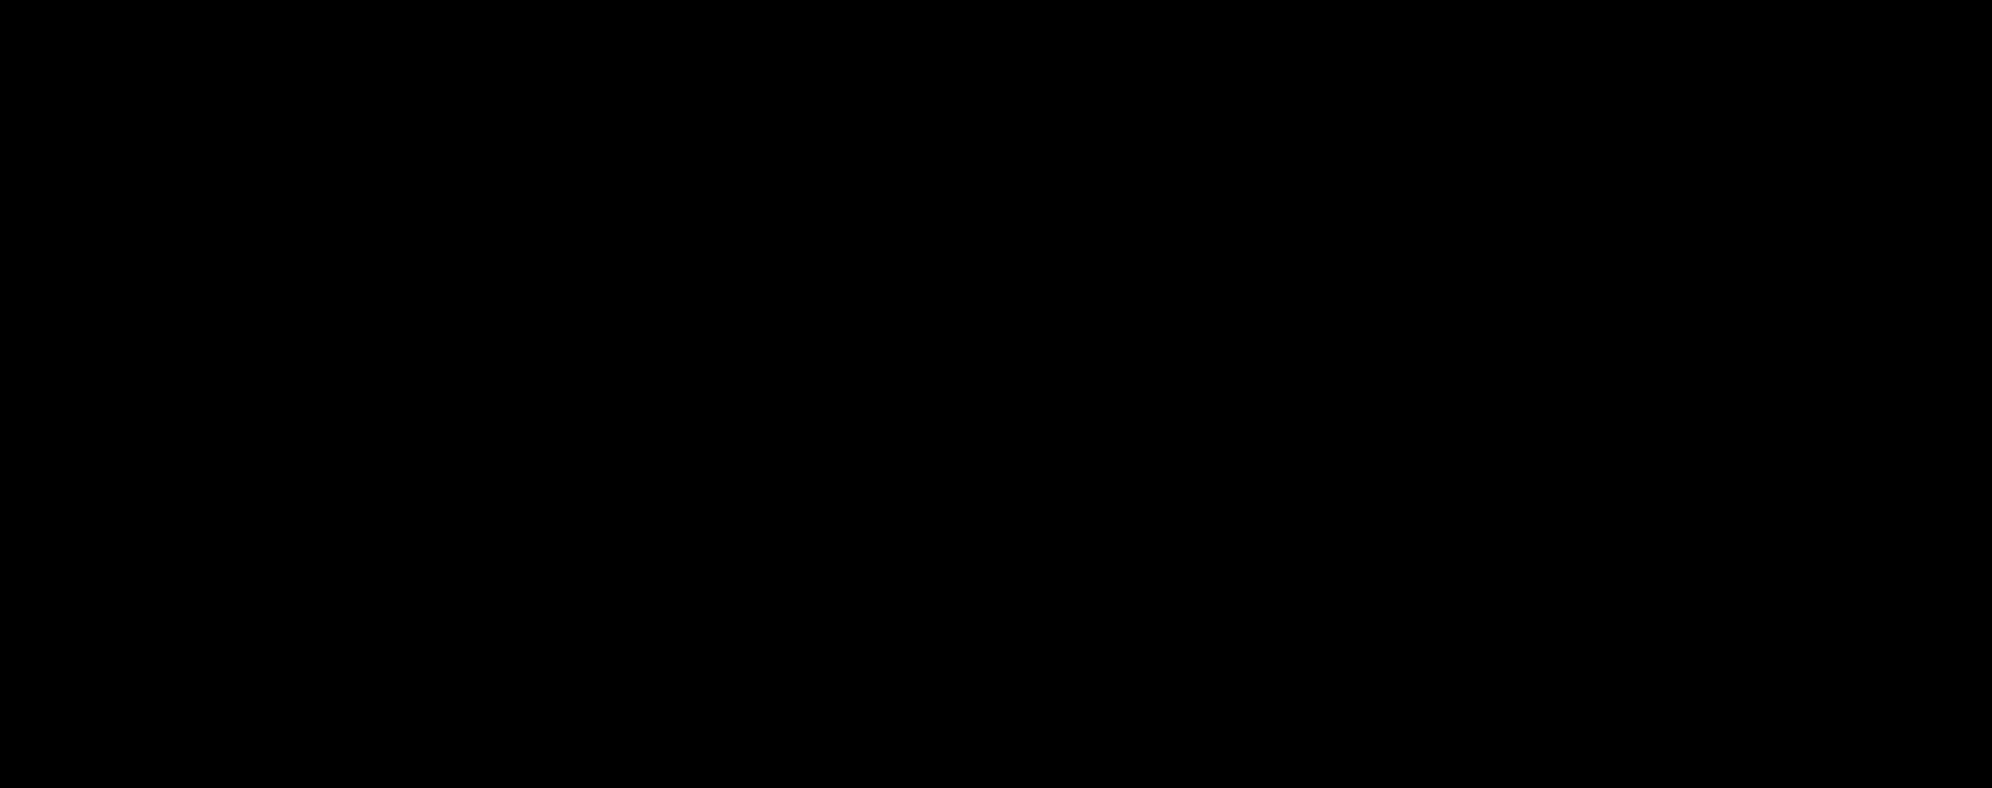 N-Acetylserotonin β-D-glucuronide-d<sub>4</sub>